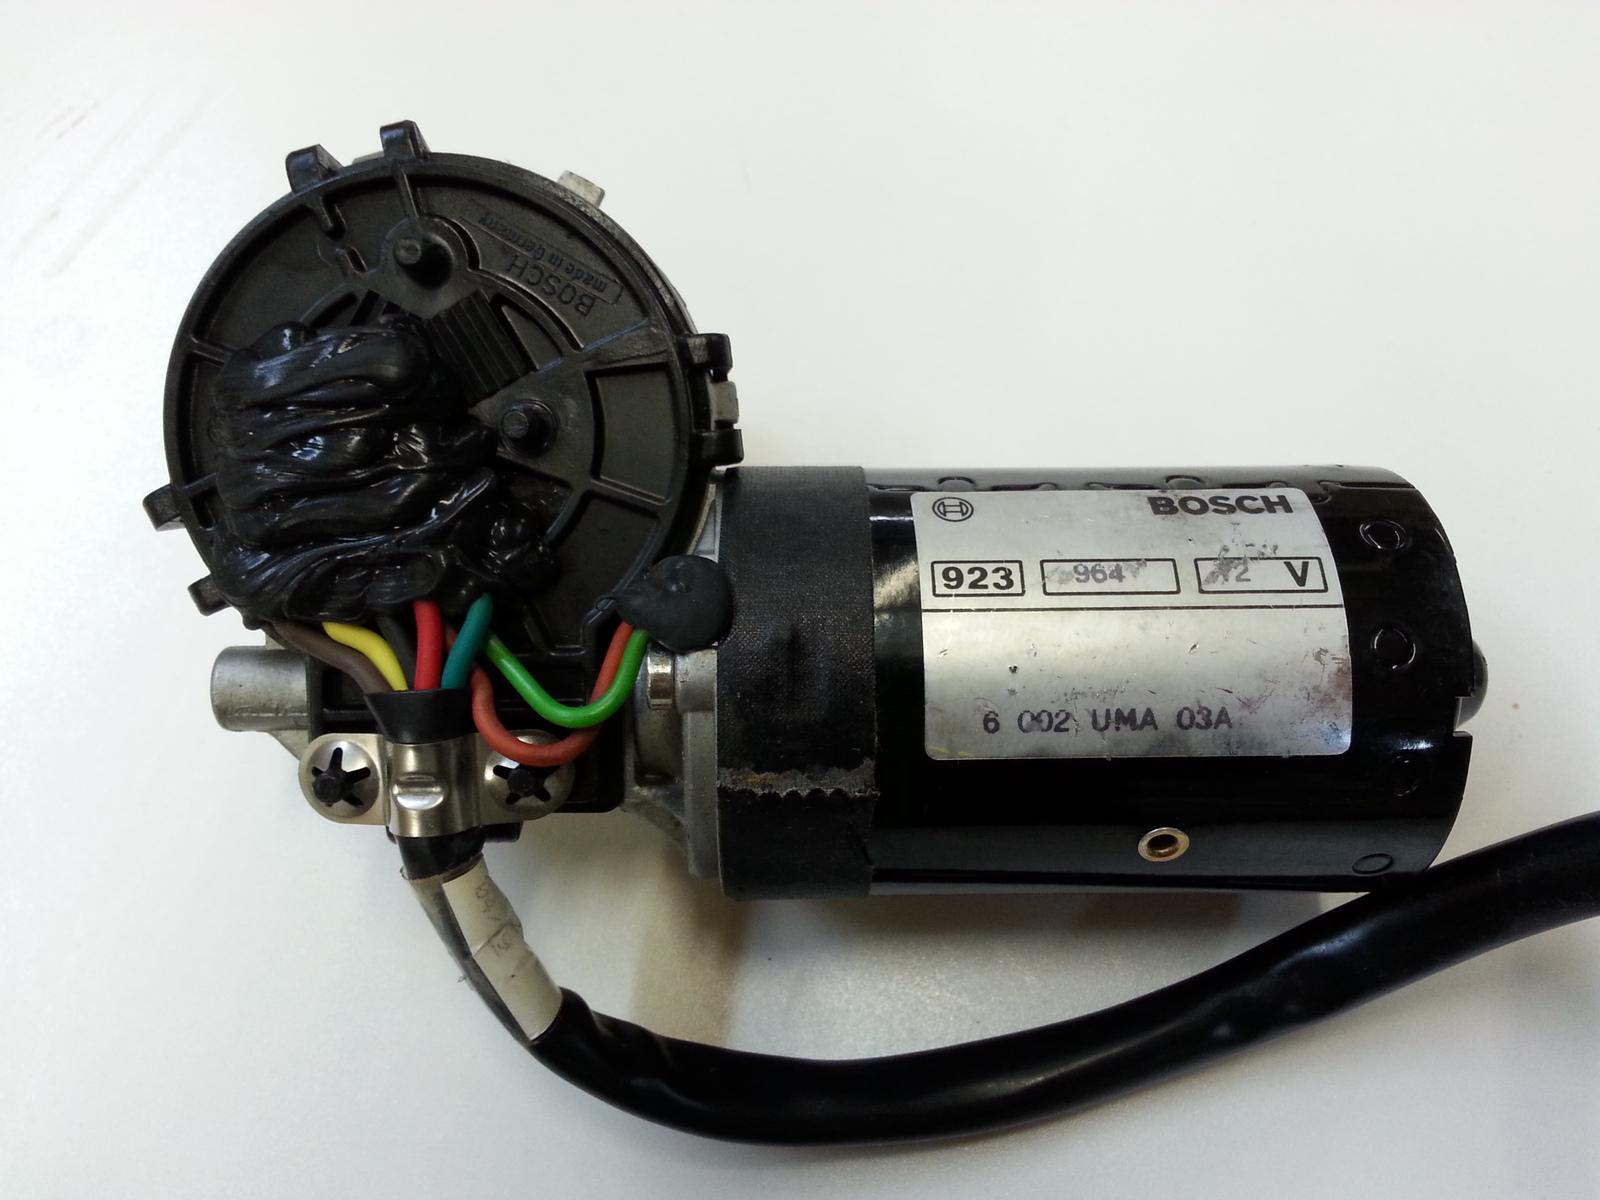 Bosch 923 964 12v Wiper Motor Windshield Wiper Systems